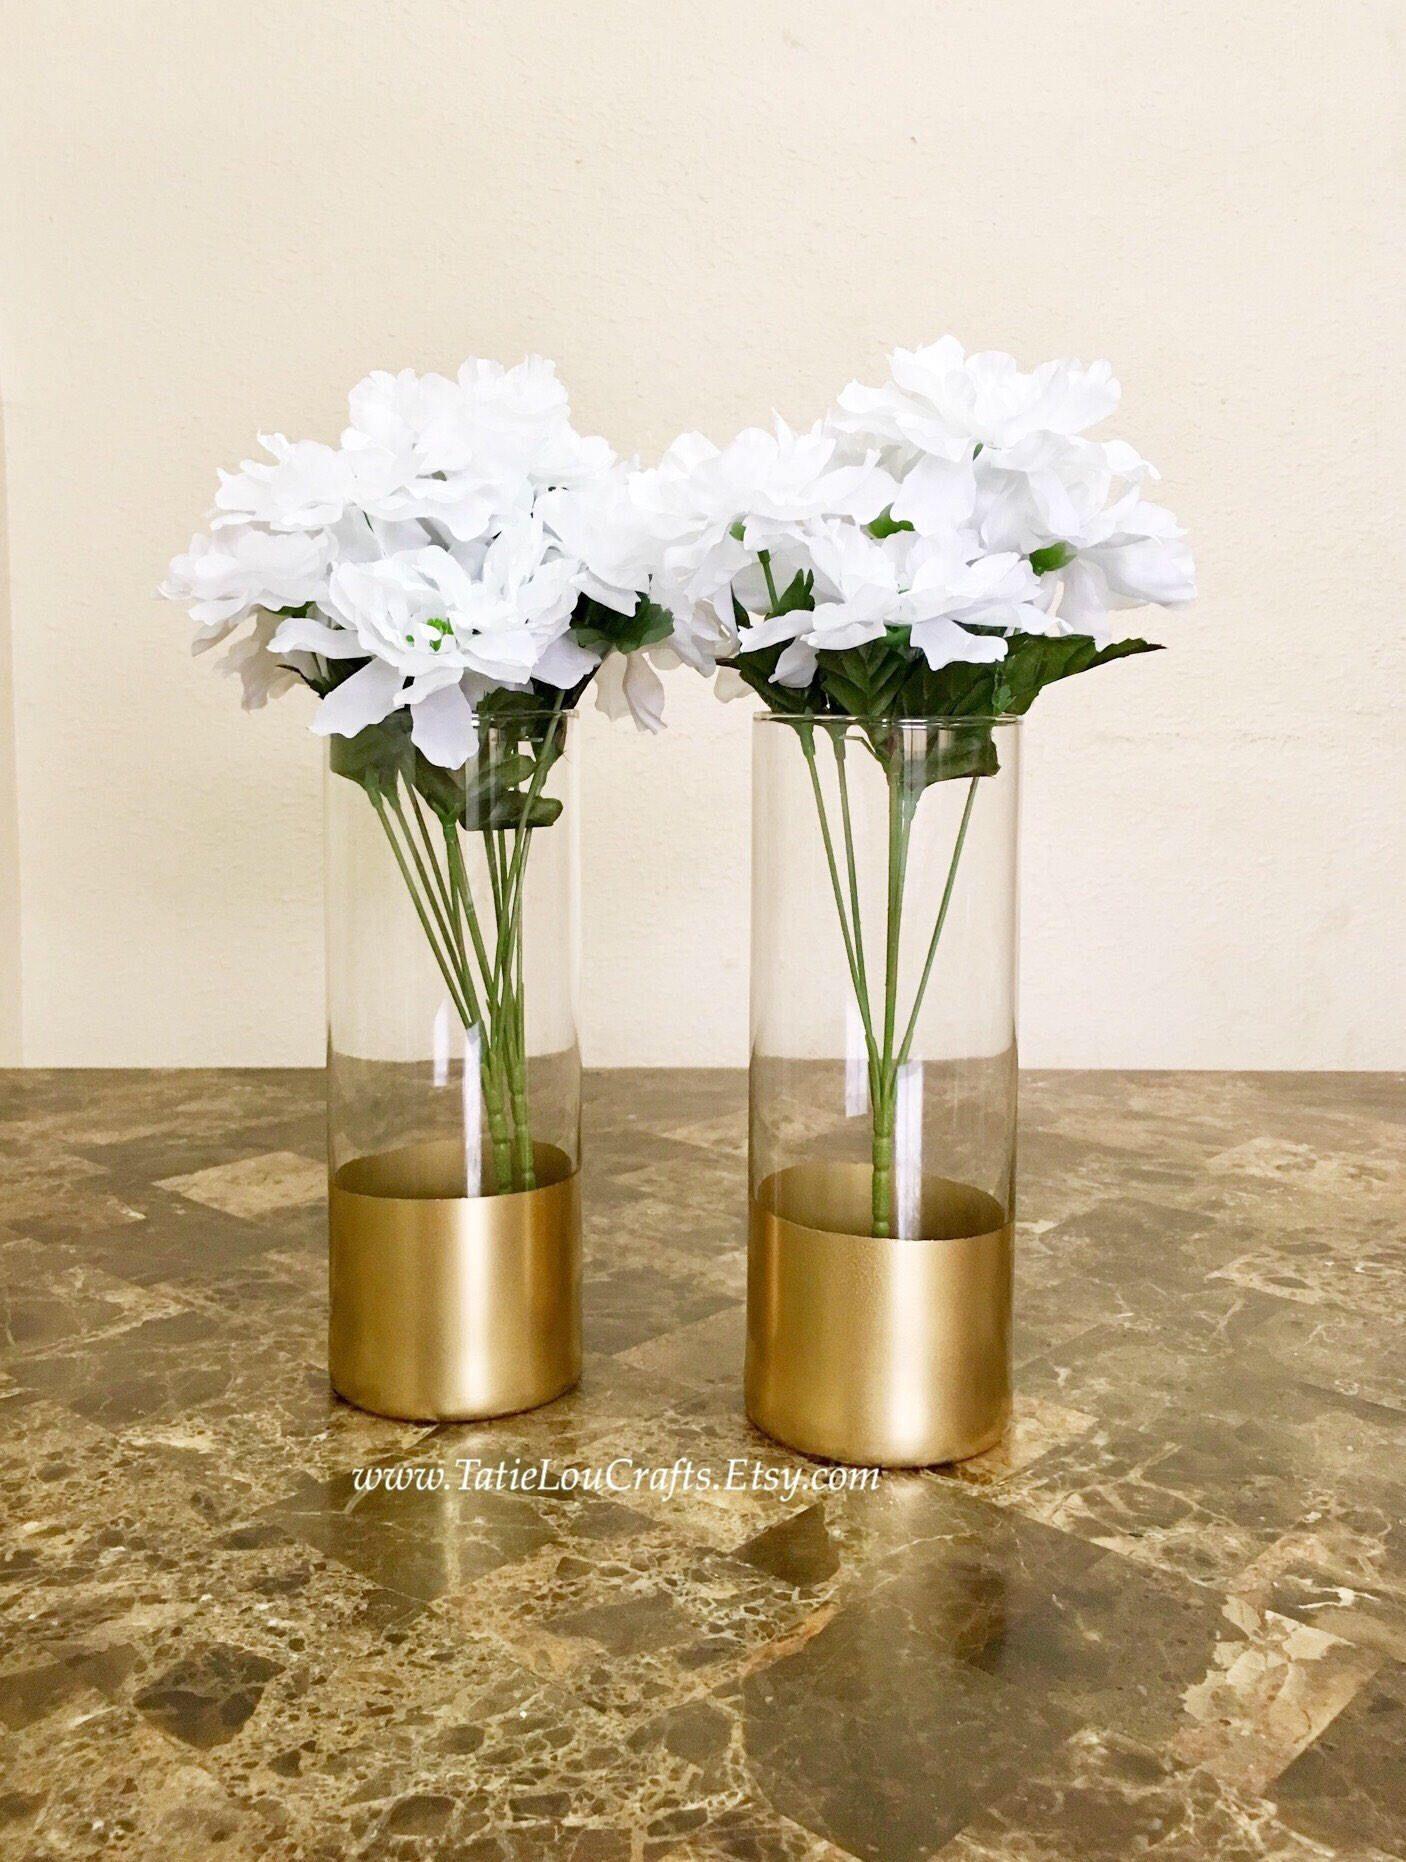 Set of 2 gold dipped vasescylinder vases wedding centerpiece set of 2 gold dipped vasescylinder vases wedding centerpiecegold vases reviewsmspy